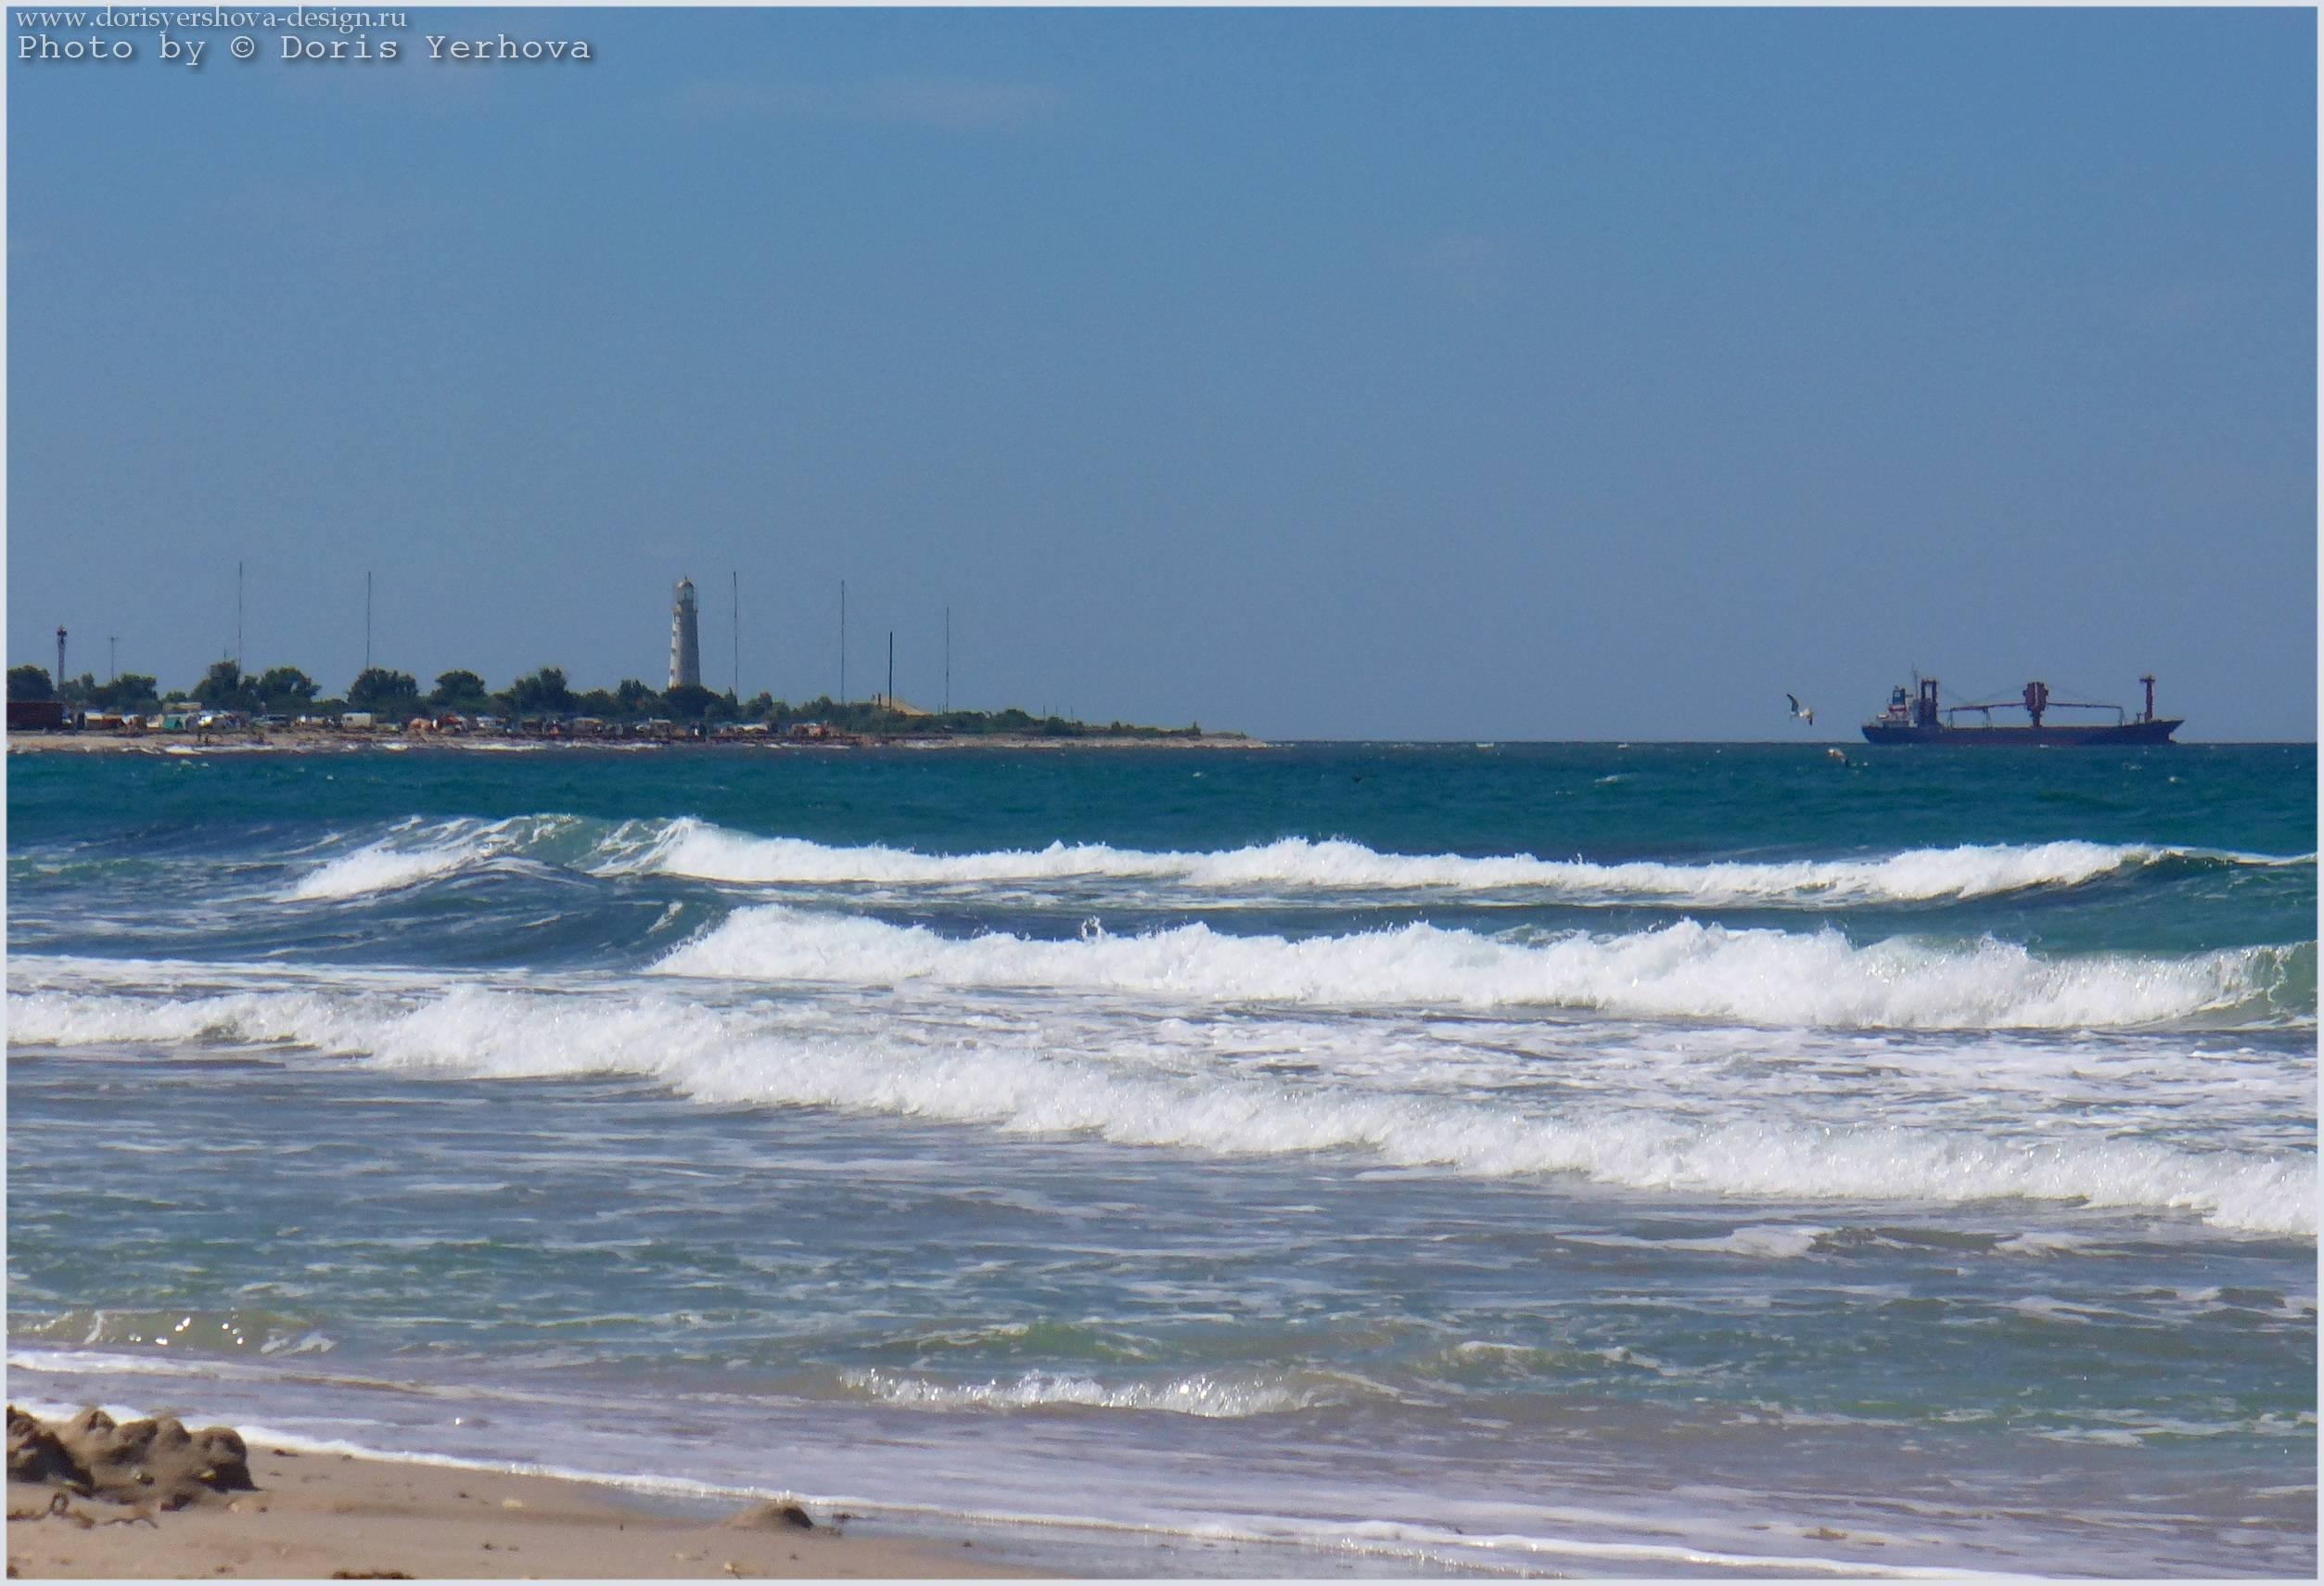 Крым. Тарханкут. Пляж Оленевки. Вид на маяк. Фото - Дорис Ершова